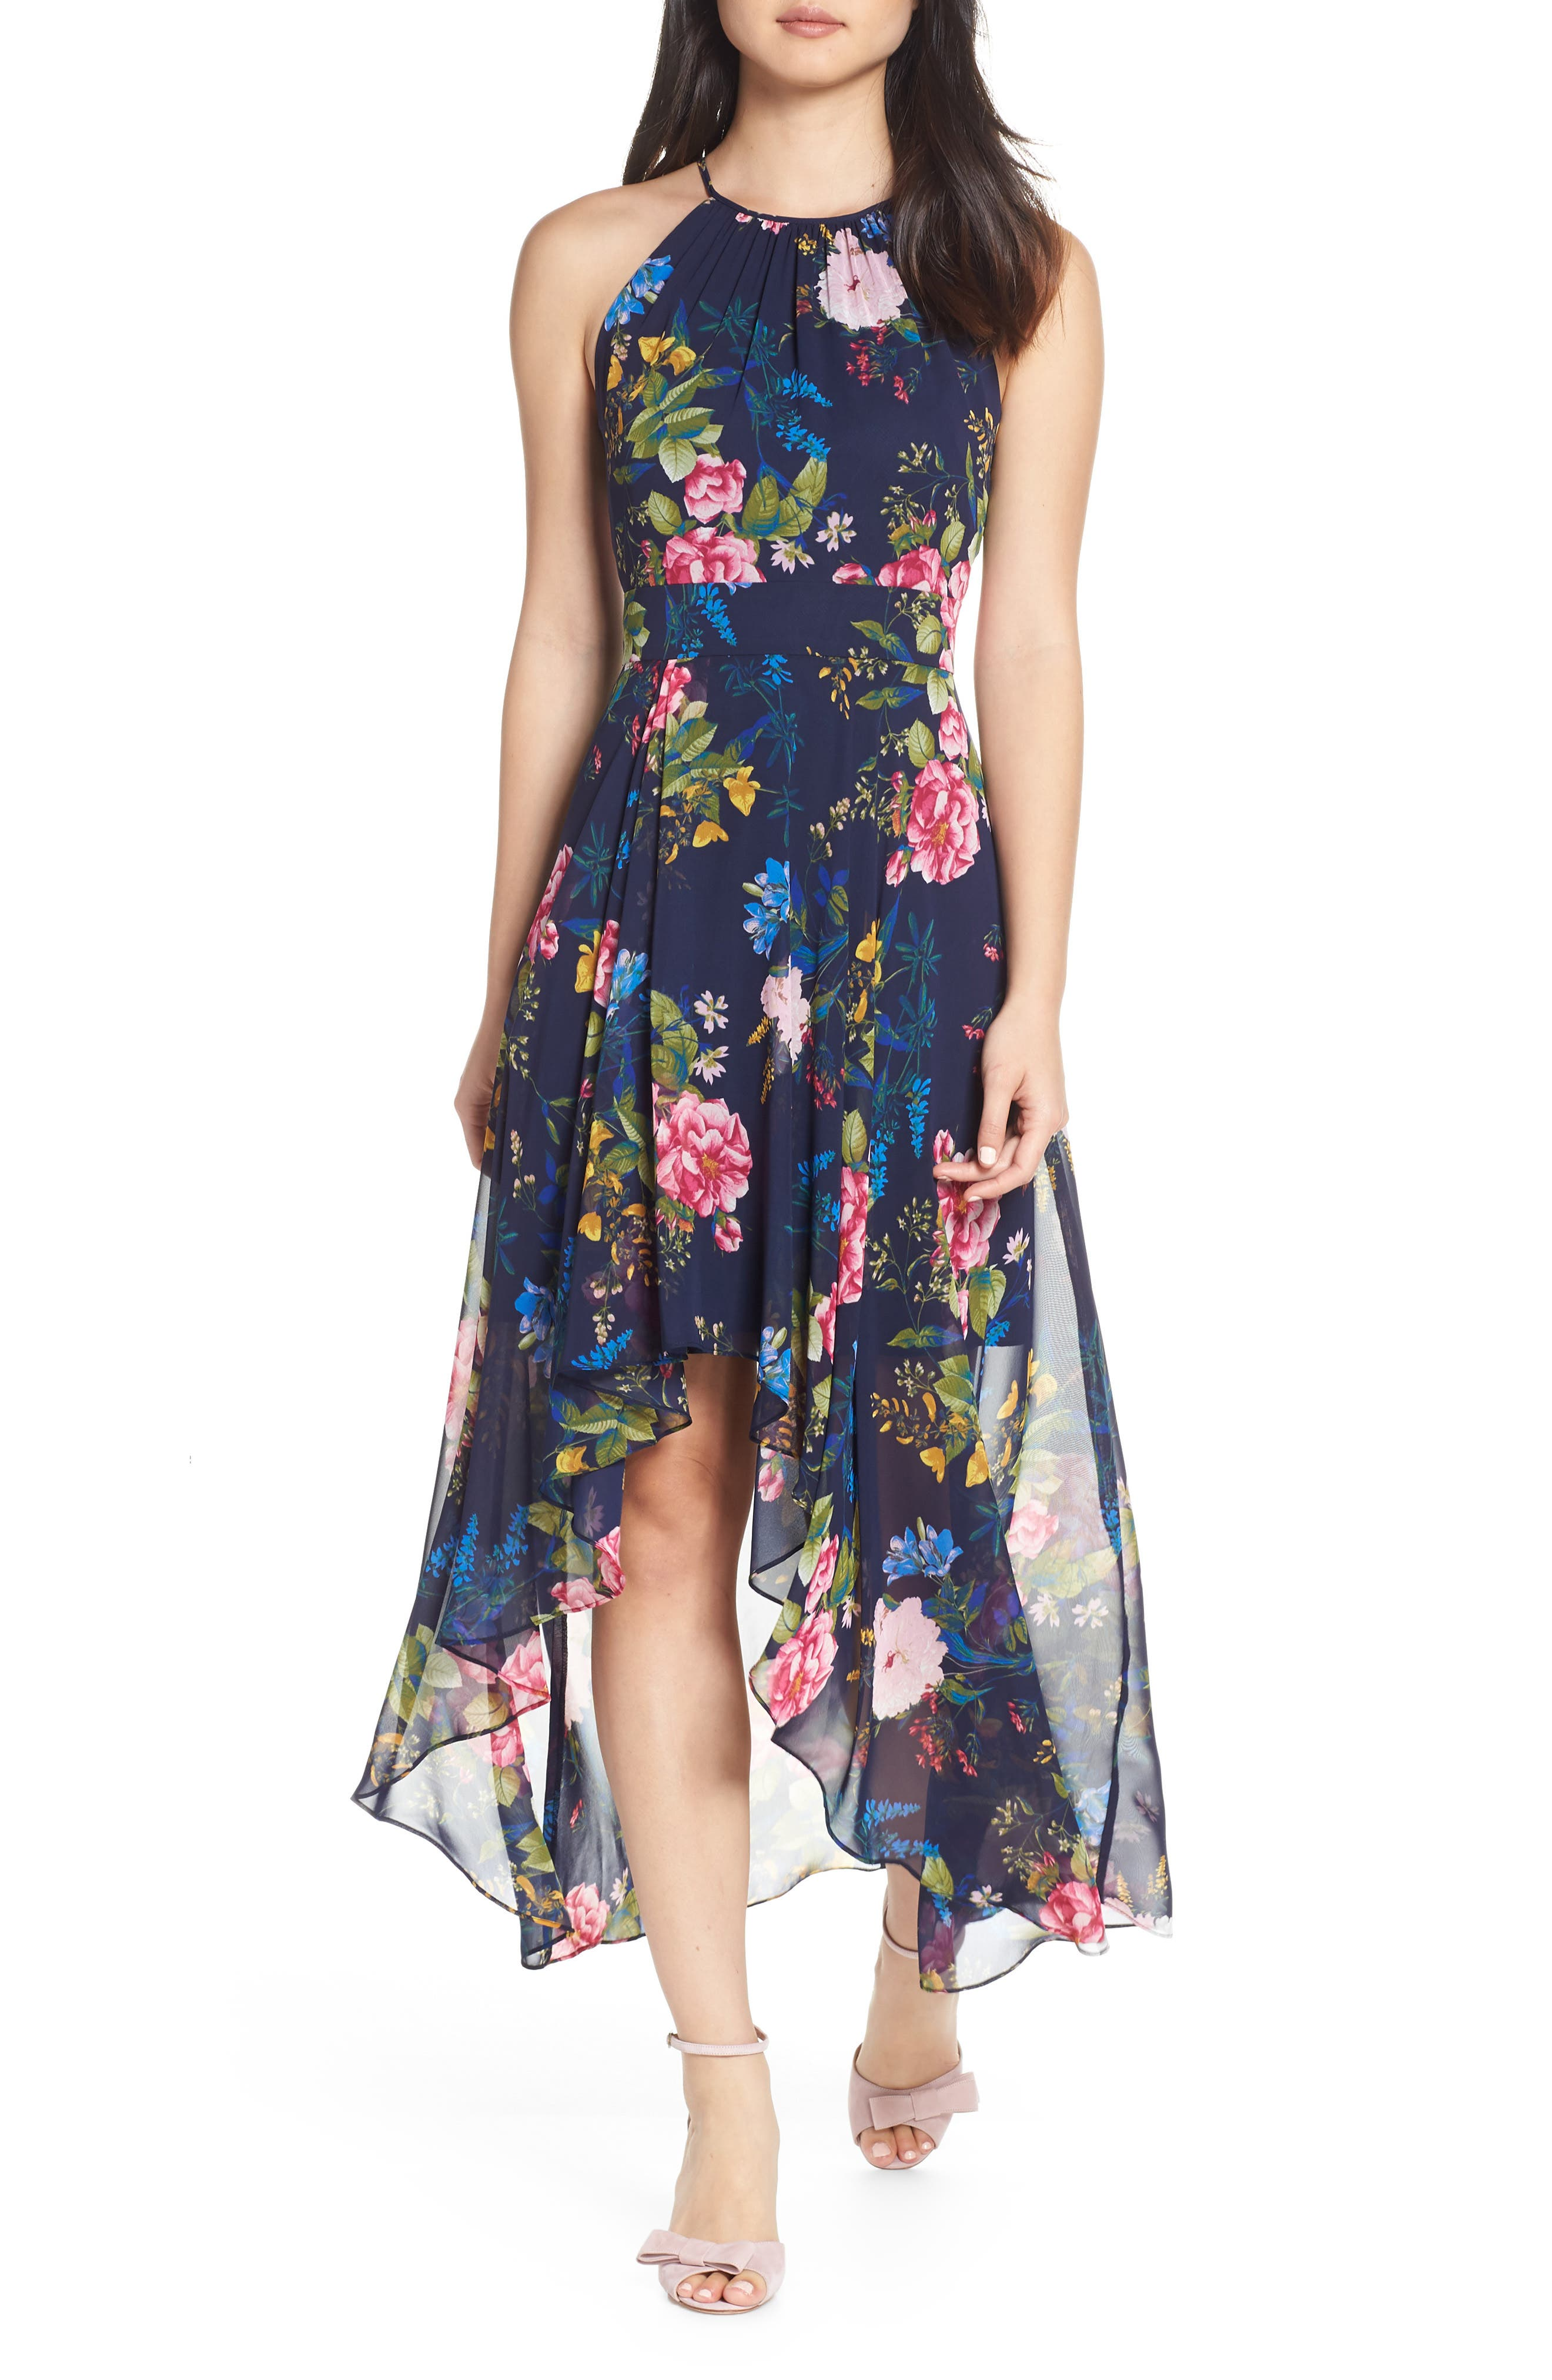 ELIZA J Floral Print Chiffon Halter Dress, Main, color, NAVY